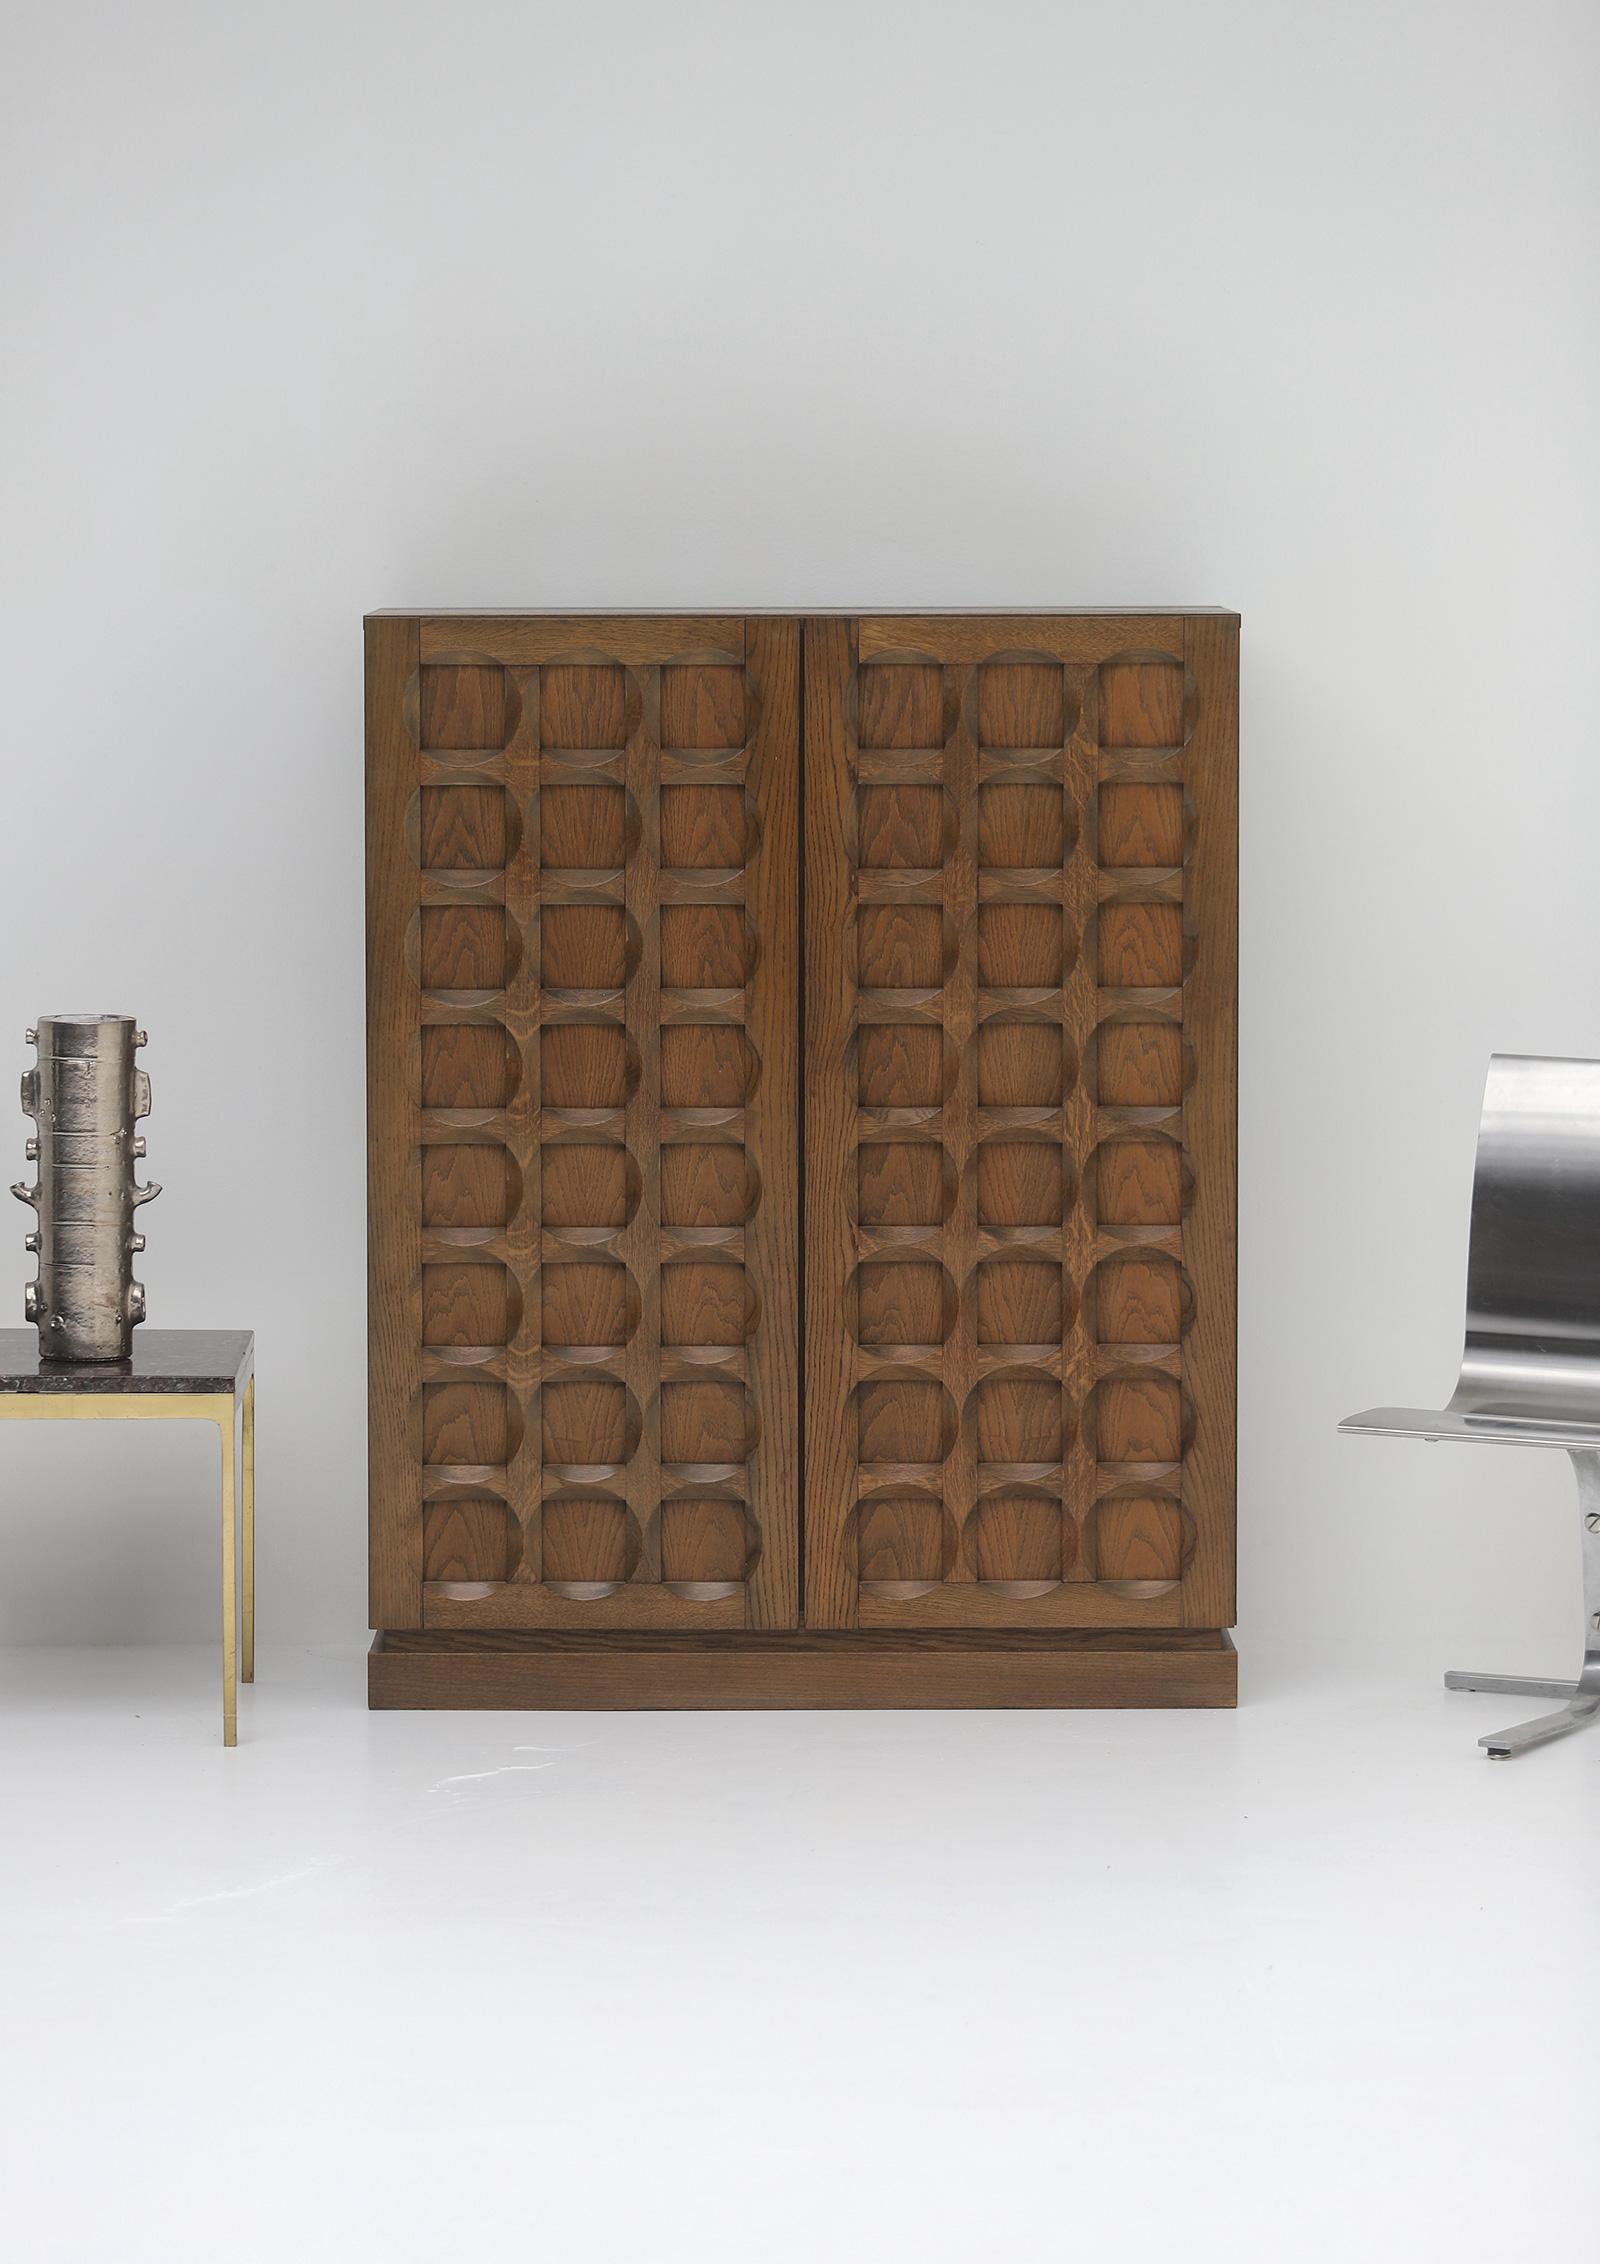 1970s Defour Cabinet Graphical Door Panels image 2